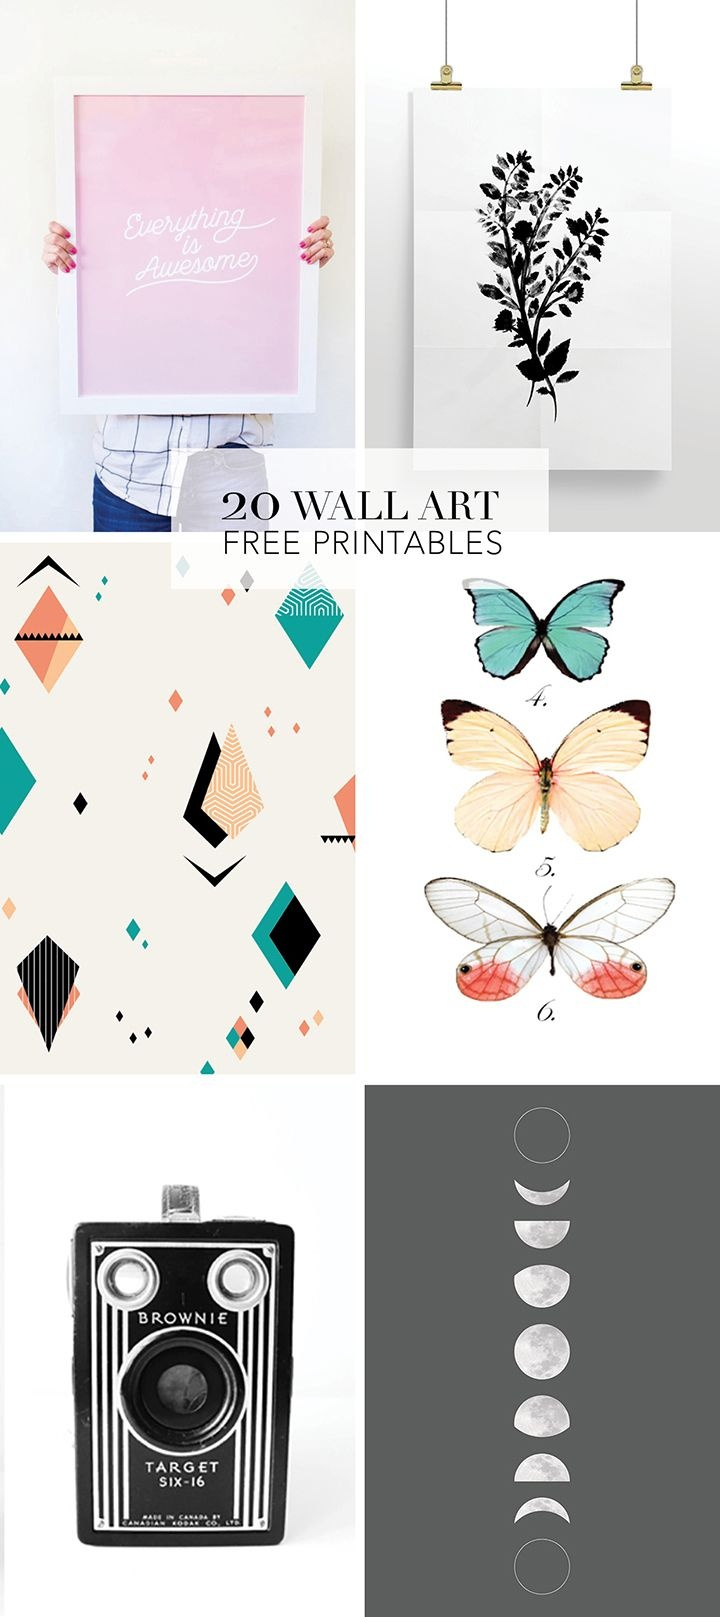 20 Favorite Wall Art Free Printables | Diy Wall Decor | Printable - Free Printable Art Pictures